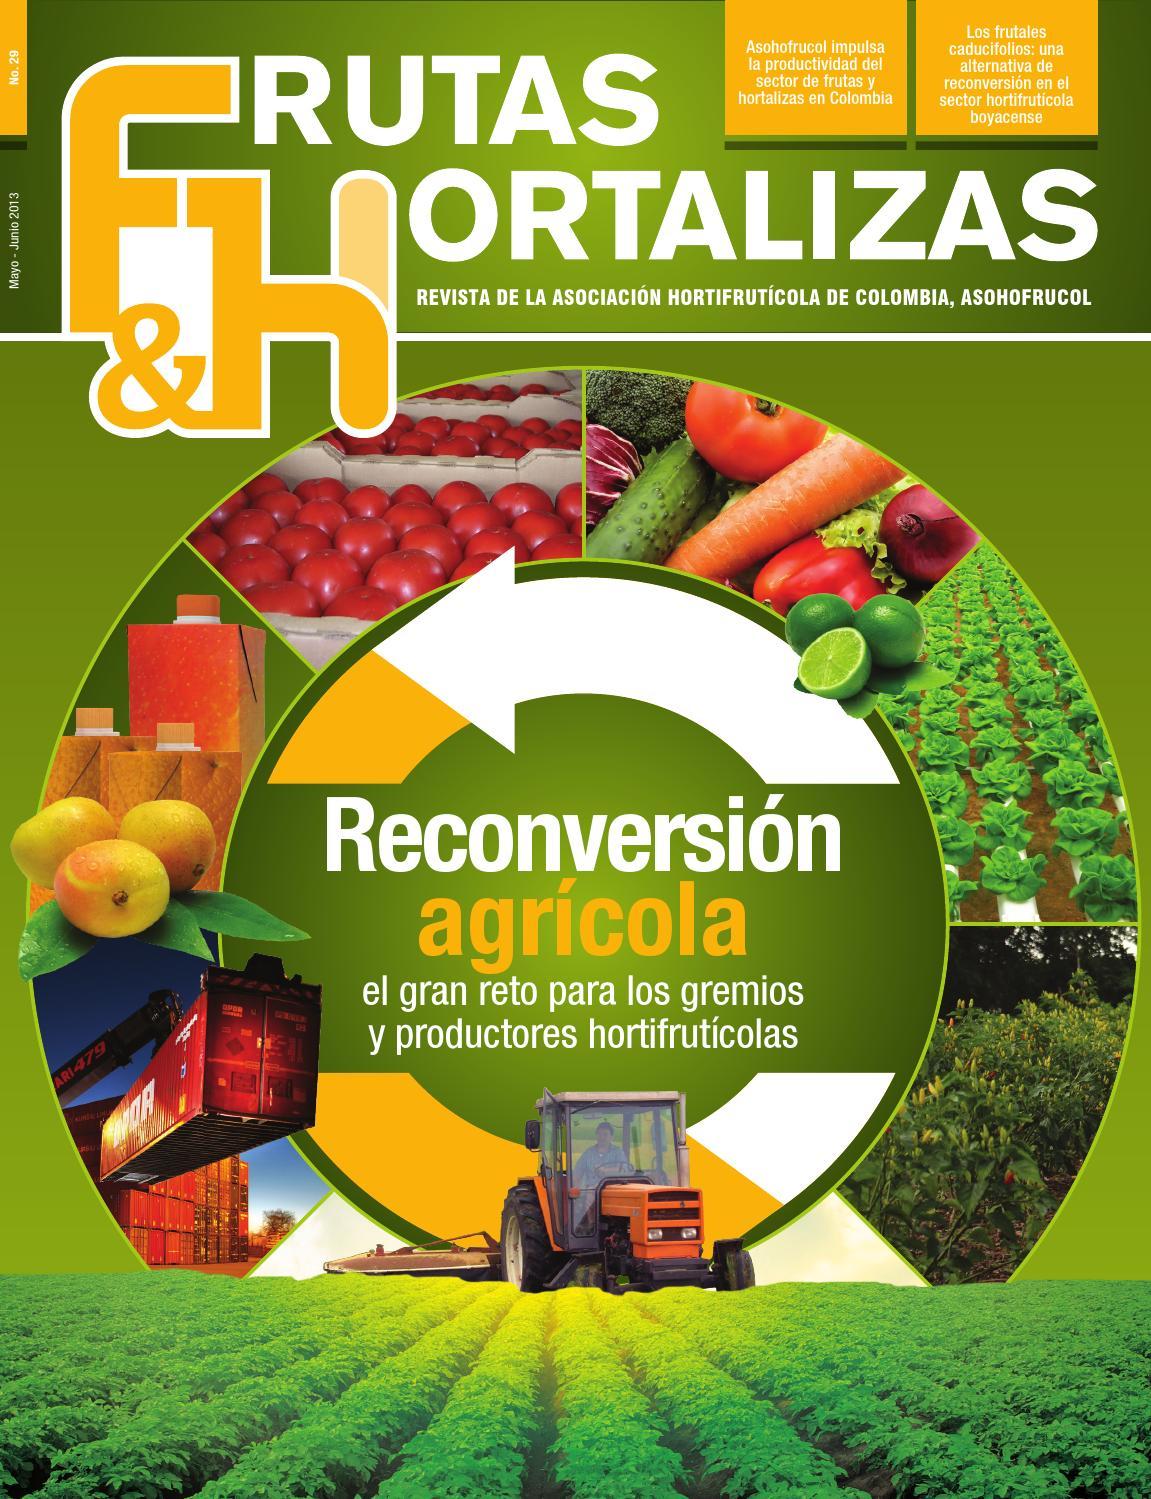 Frutas hortalizas edici n 29 by asohofrucol issuu for Asociacion de hortalizas